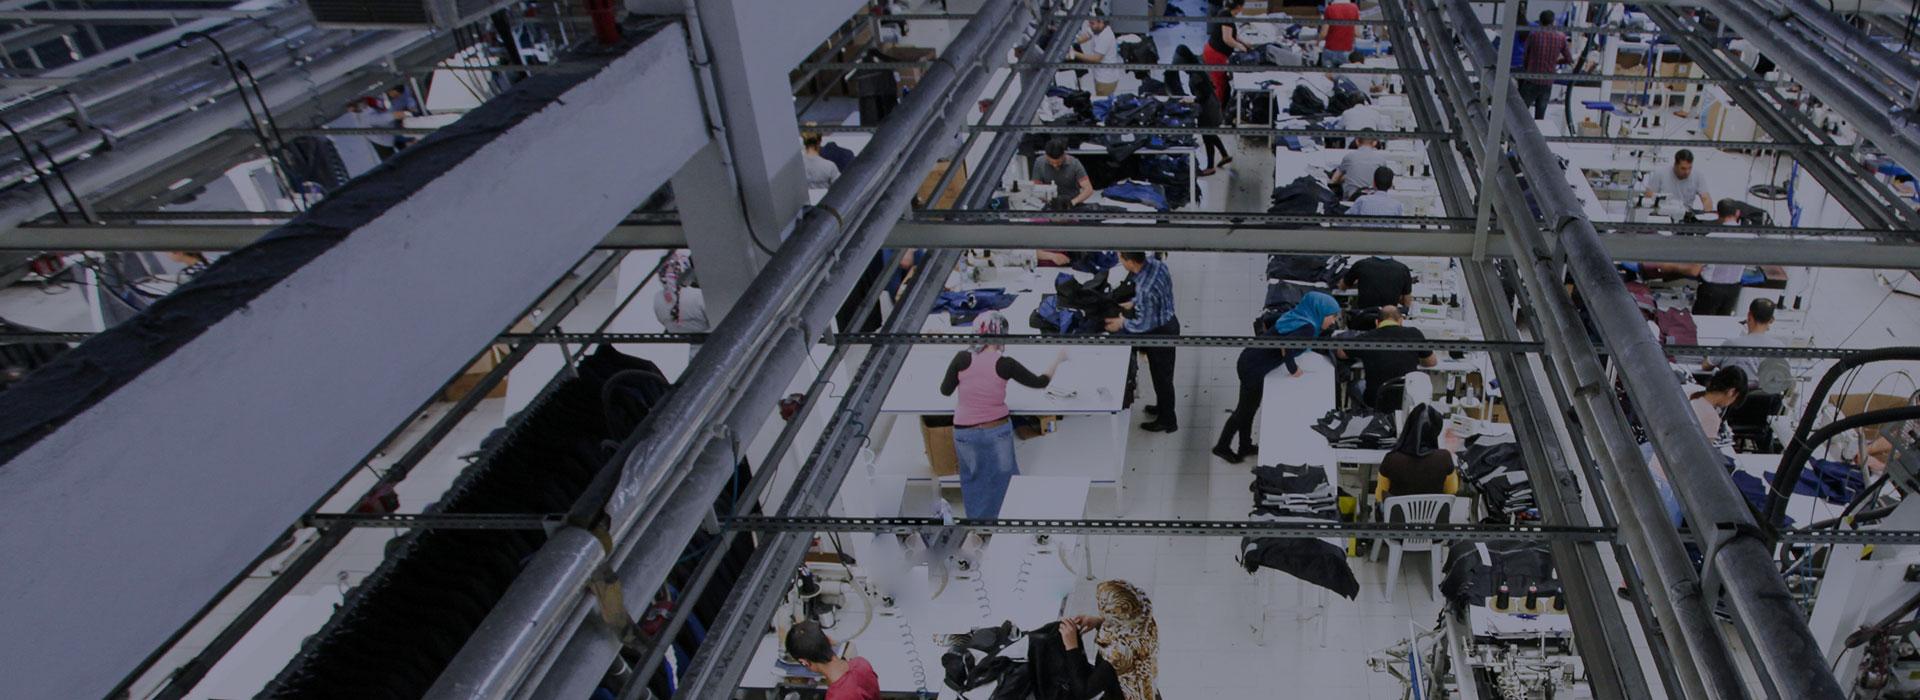 Turkish Textile Manufacturers - Clothing manufacturers in Turkey |